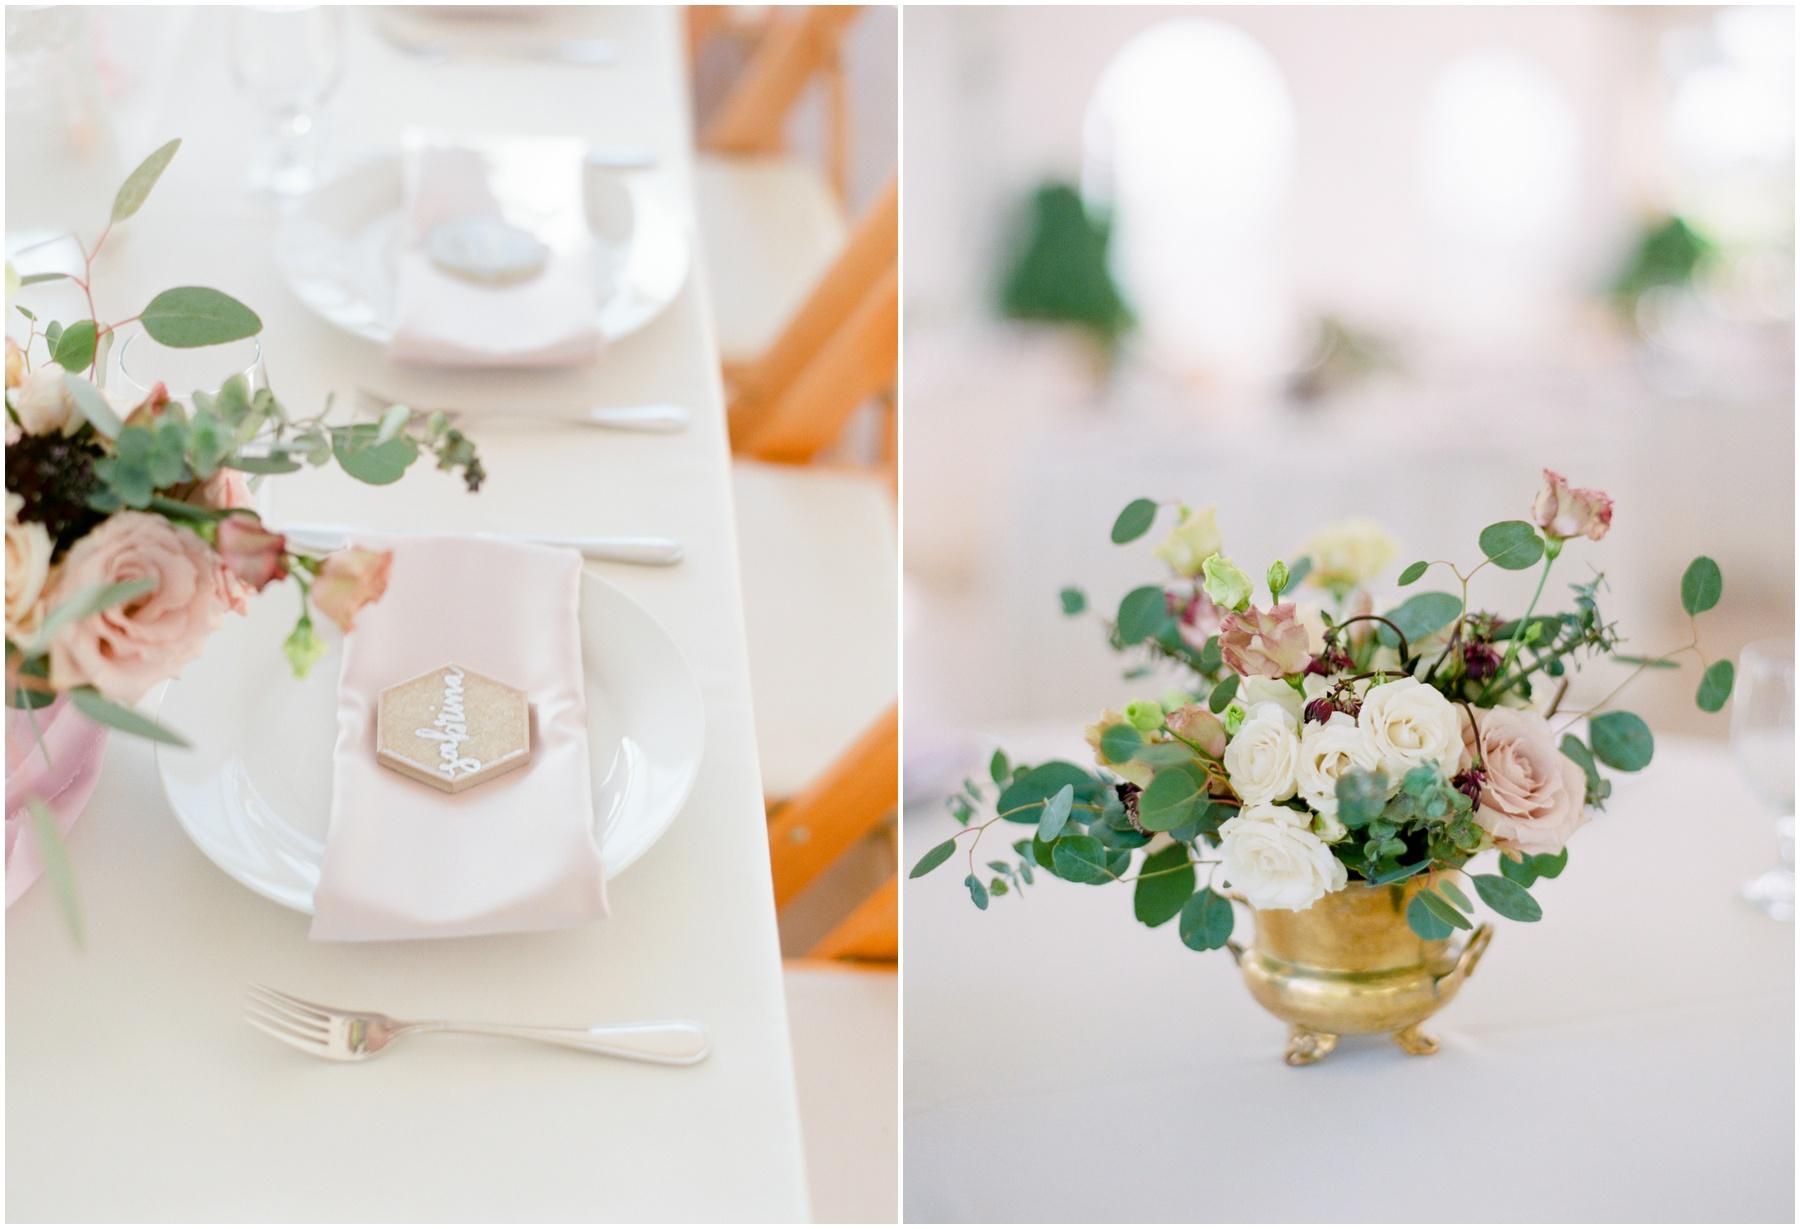 Scribner-bend-vineyards-wedding-sacramento-california-Kristine-Herman-Photography-40.jpg